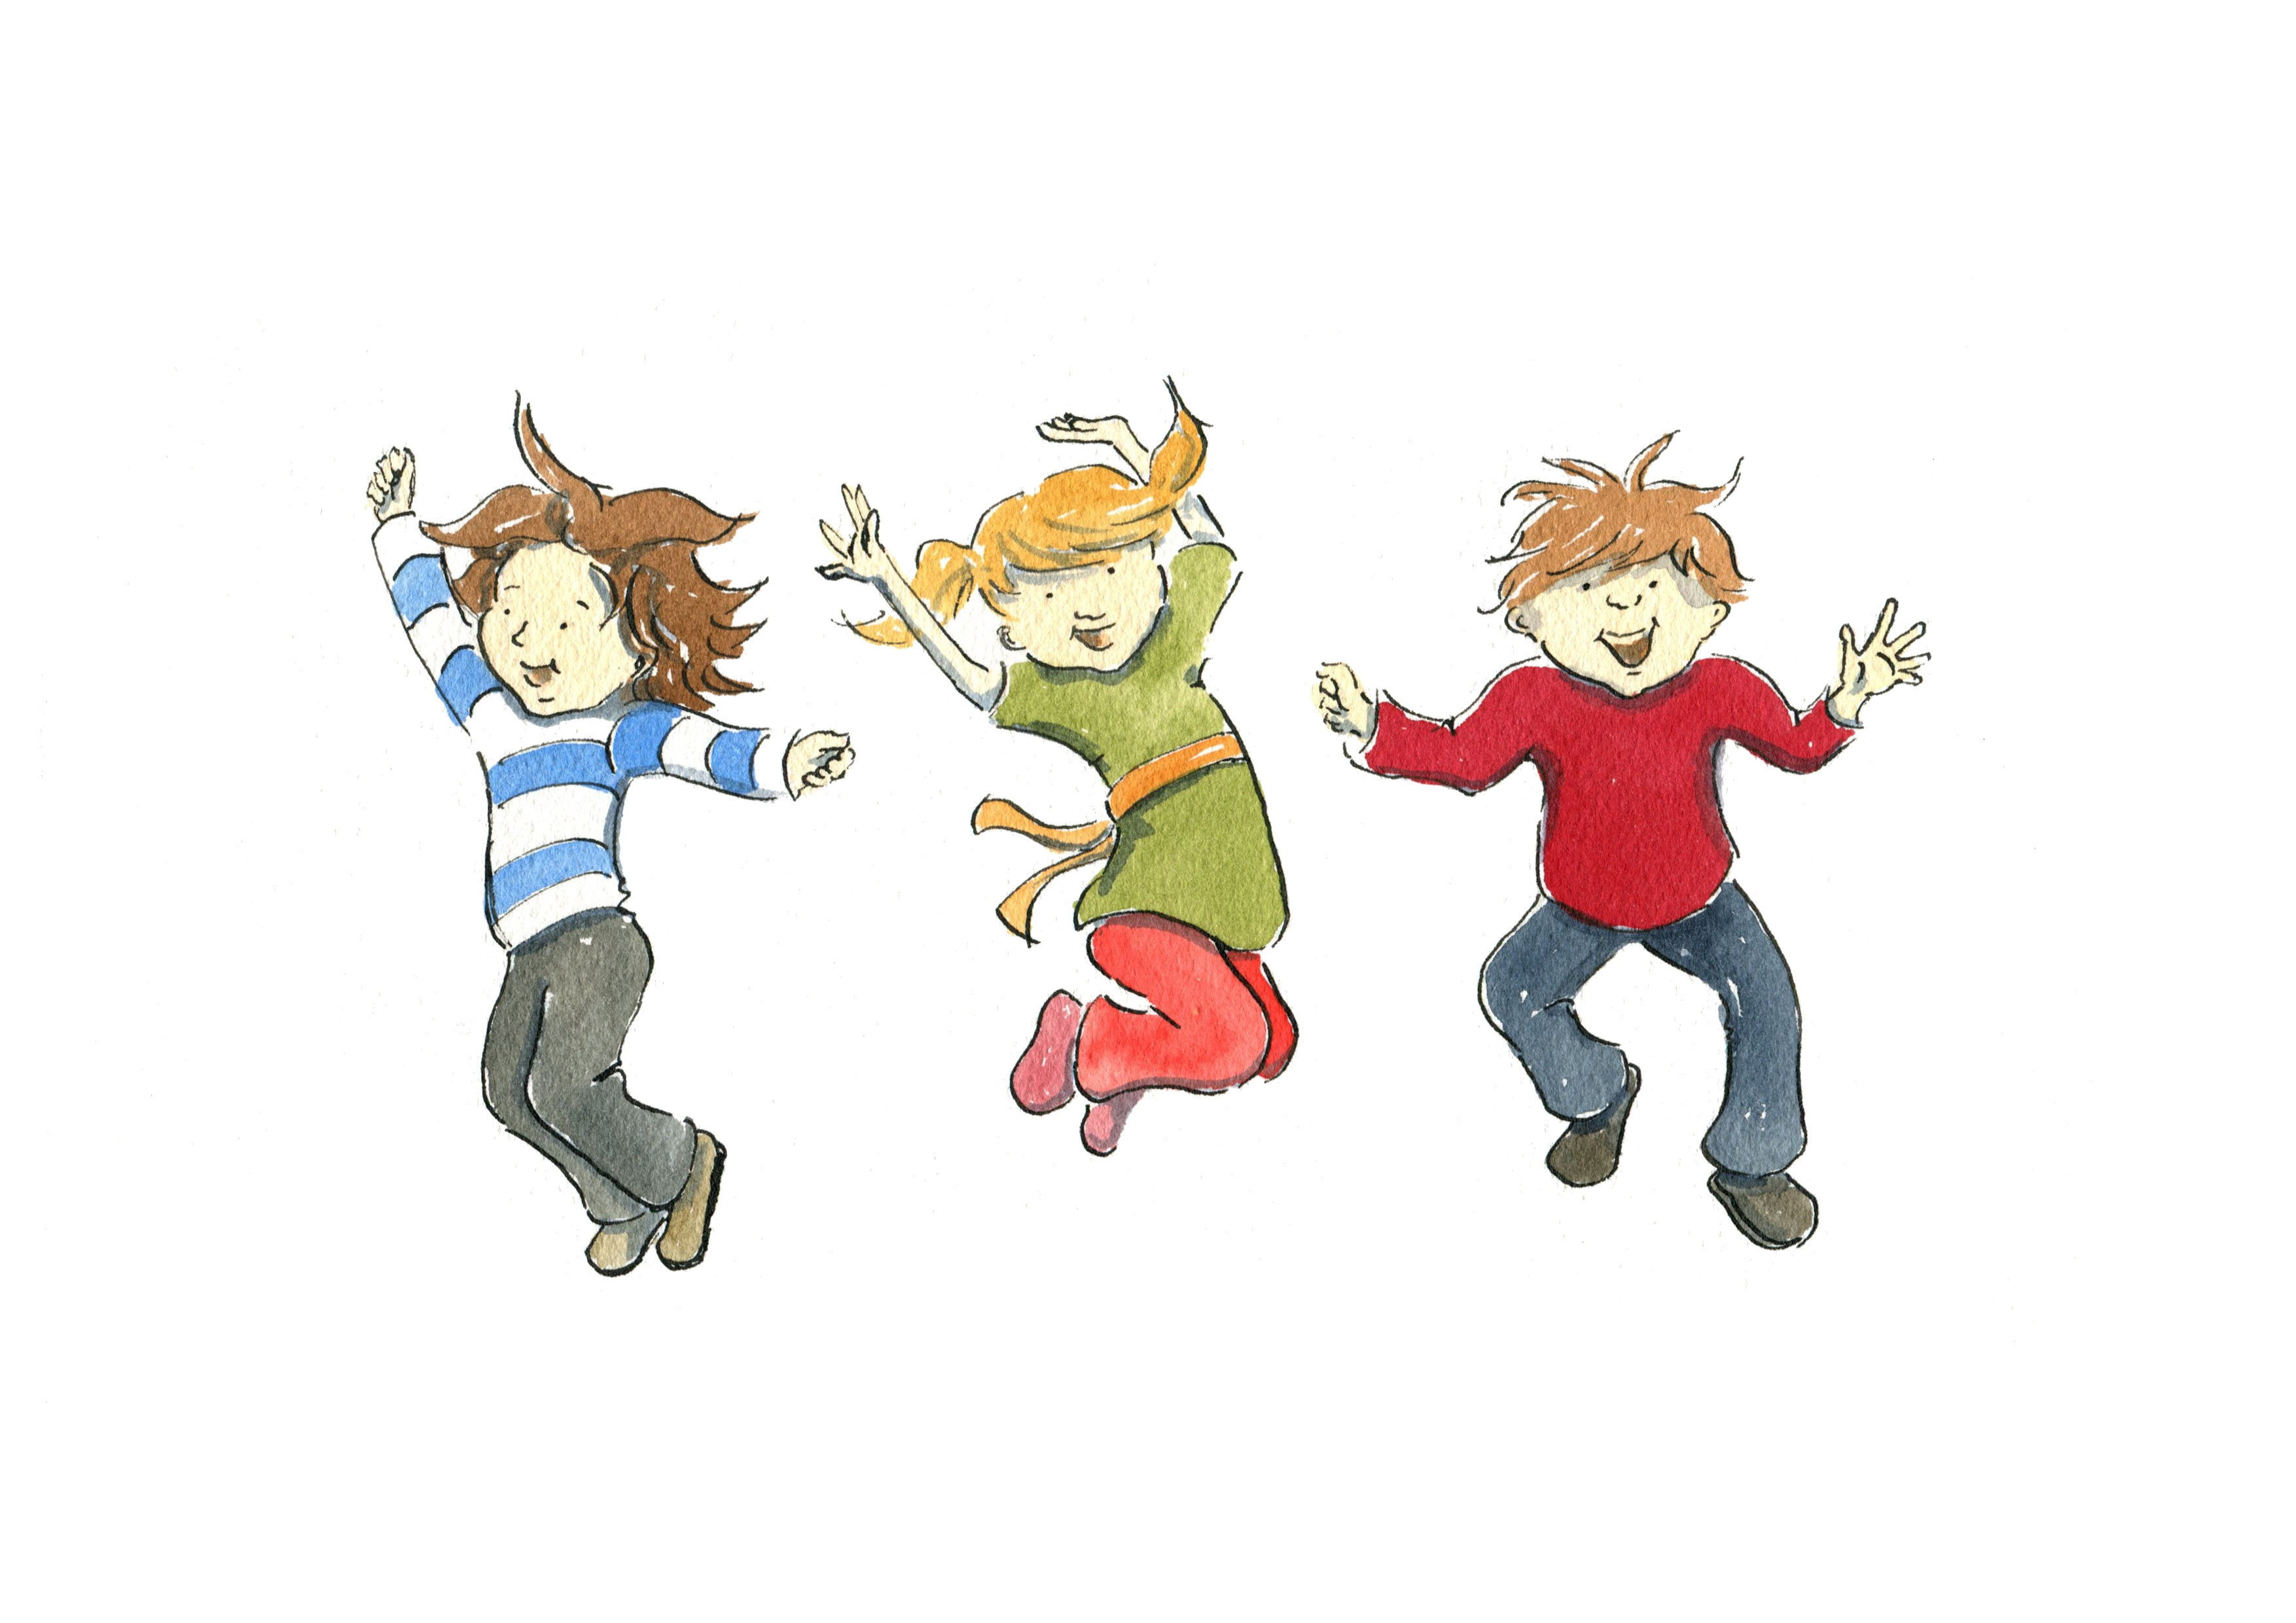 Boy Jumping Clip Art, Jumping Free Clipart.